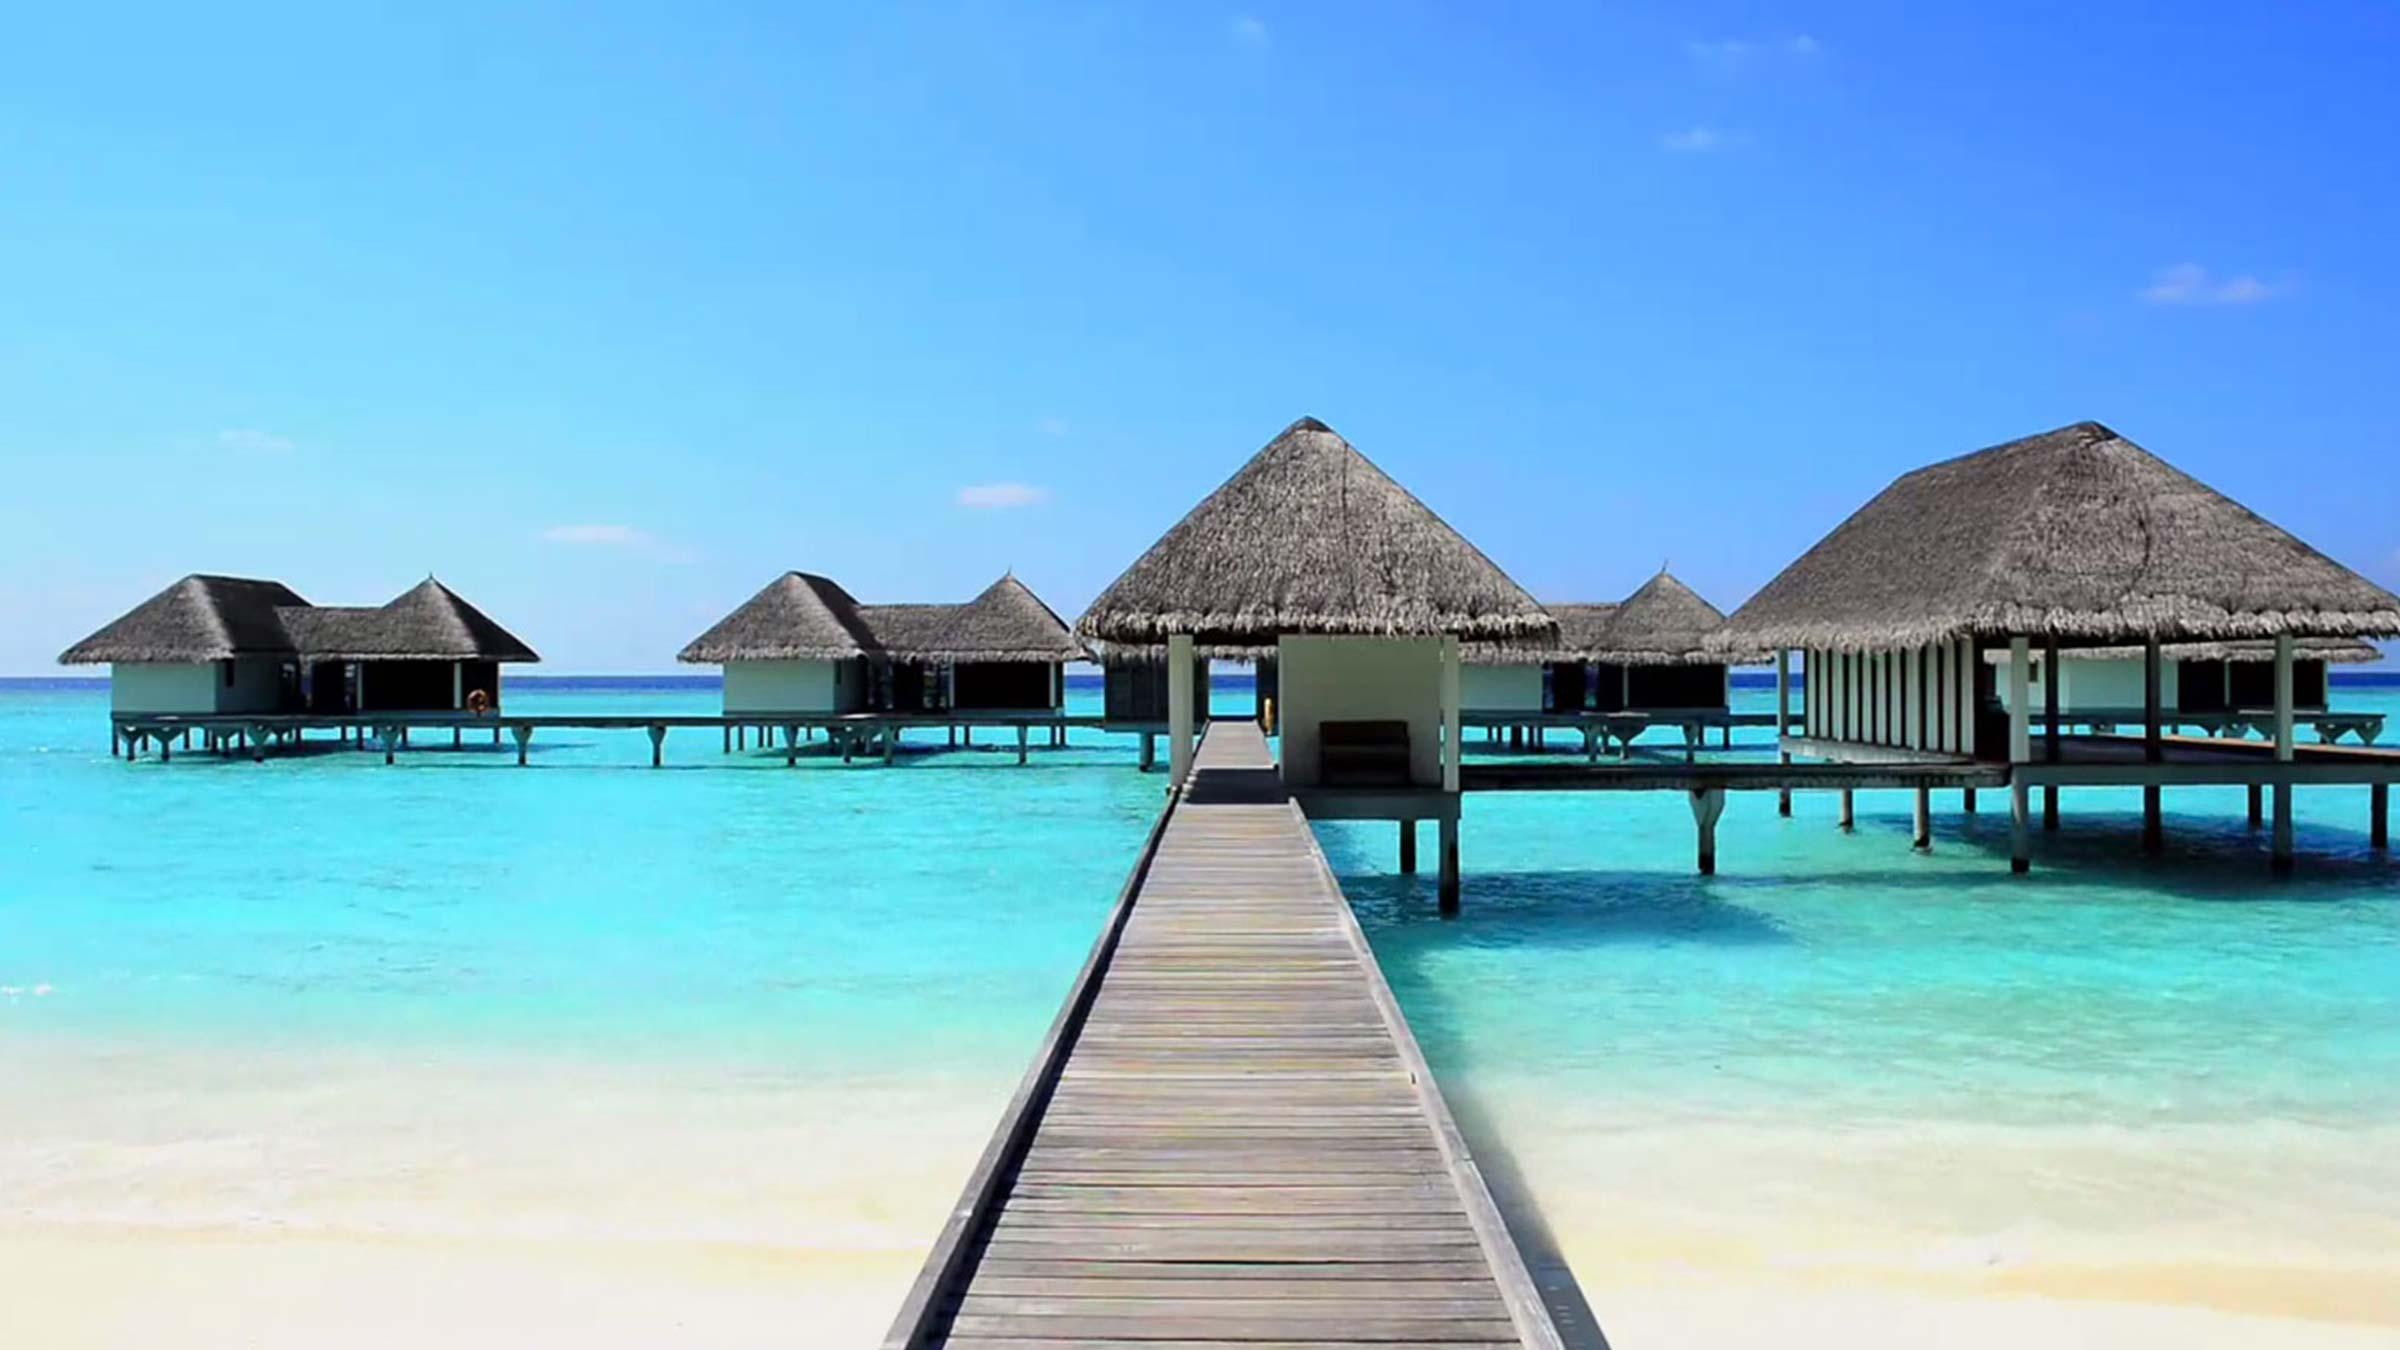 Bungalow at Four Seasons Resort Maldives